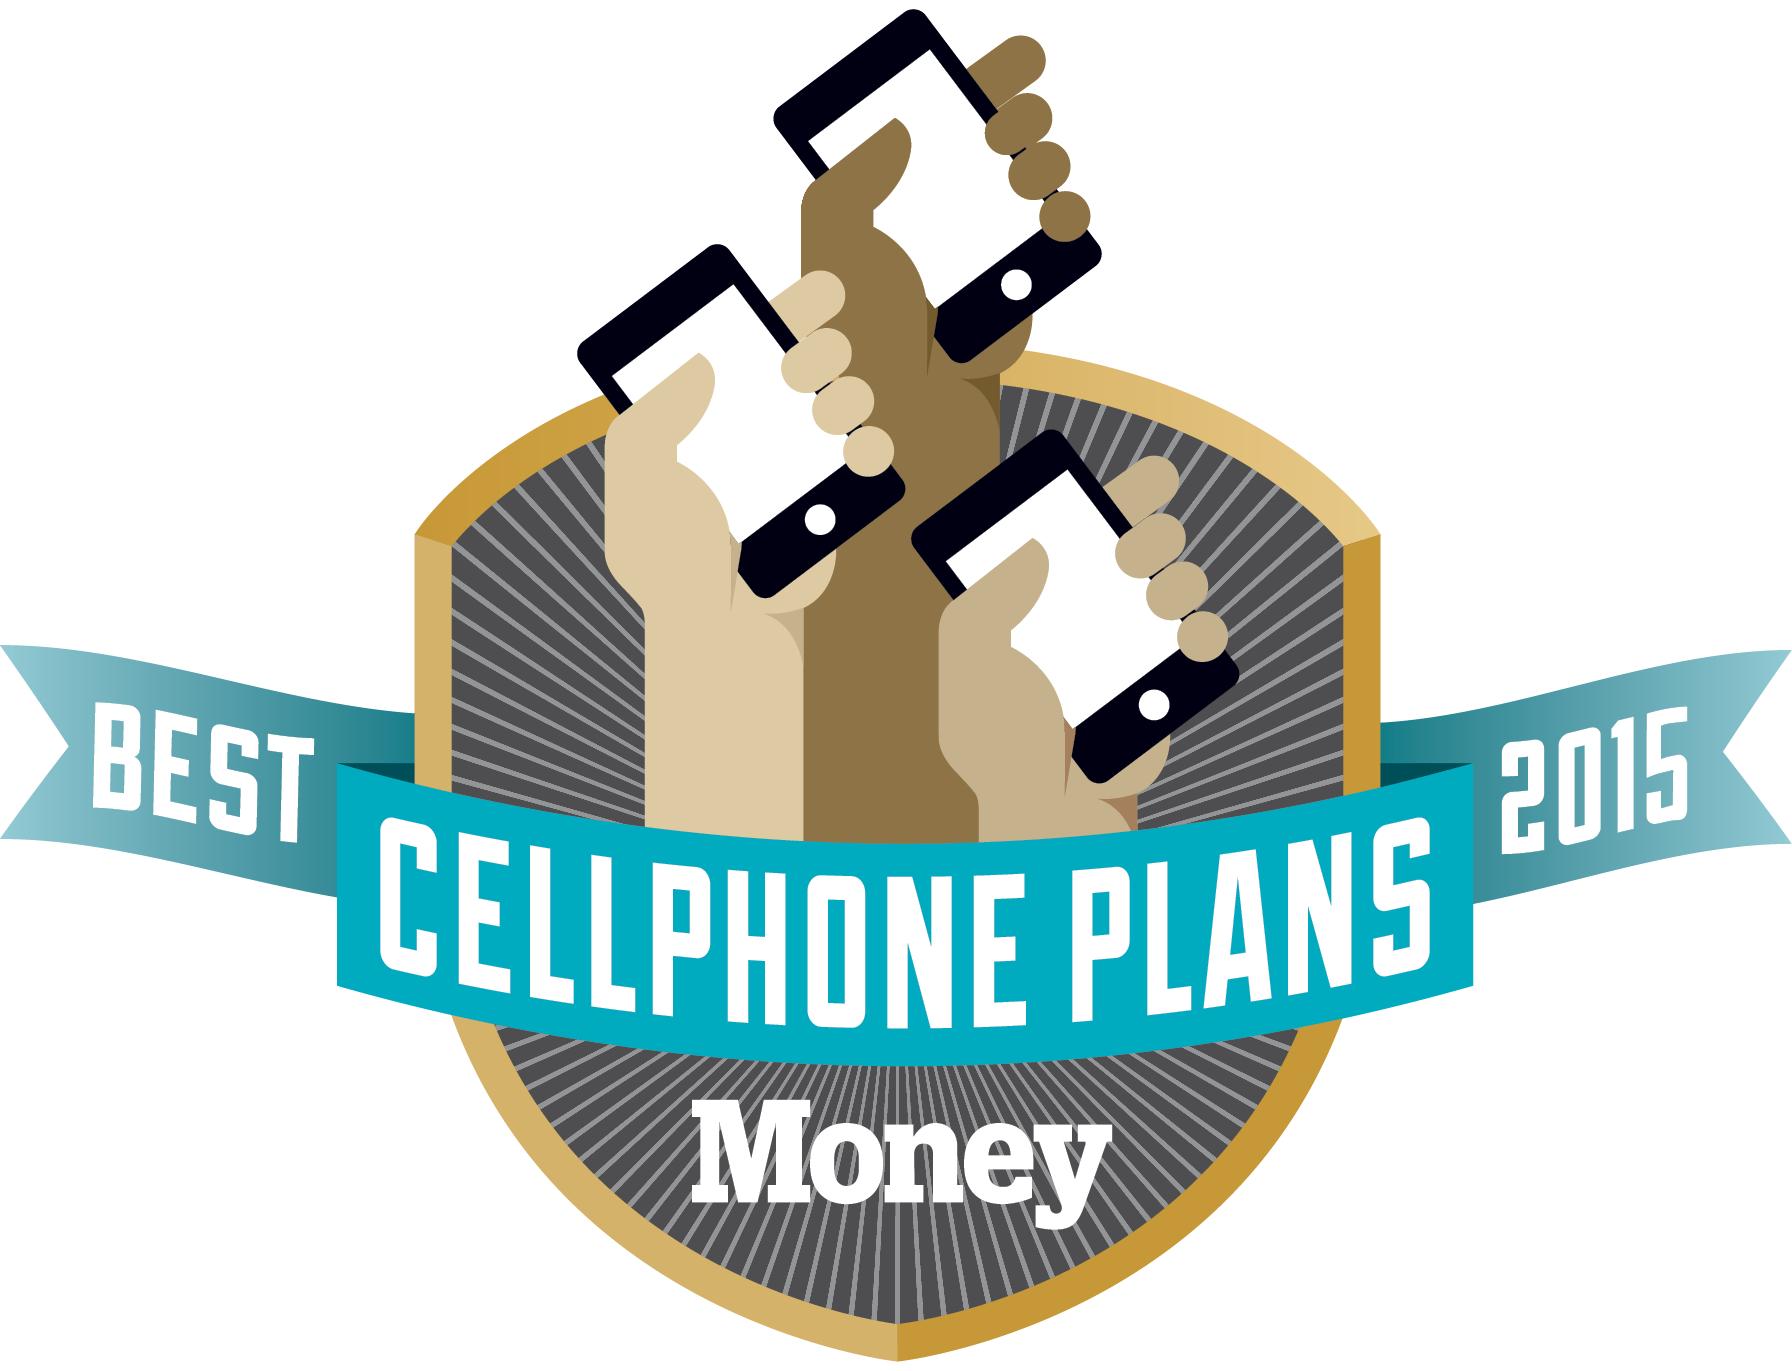 0915_CEL_best plan_franchise logo